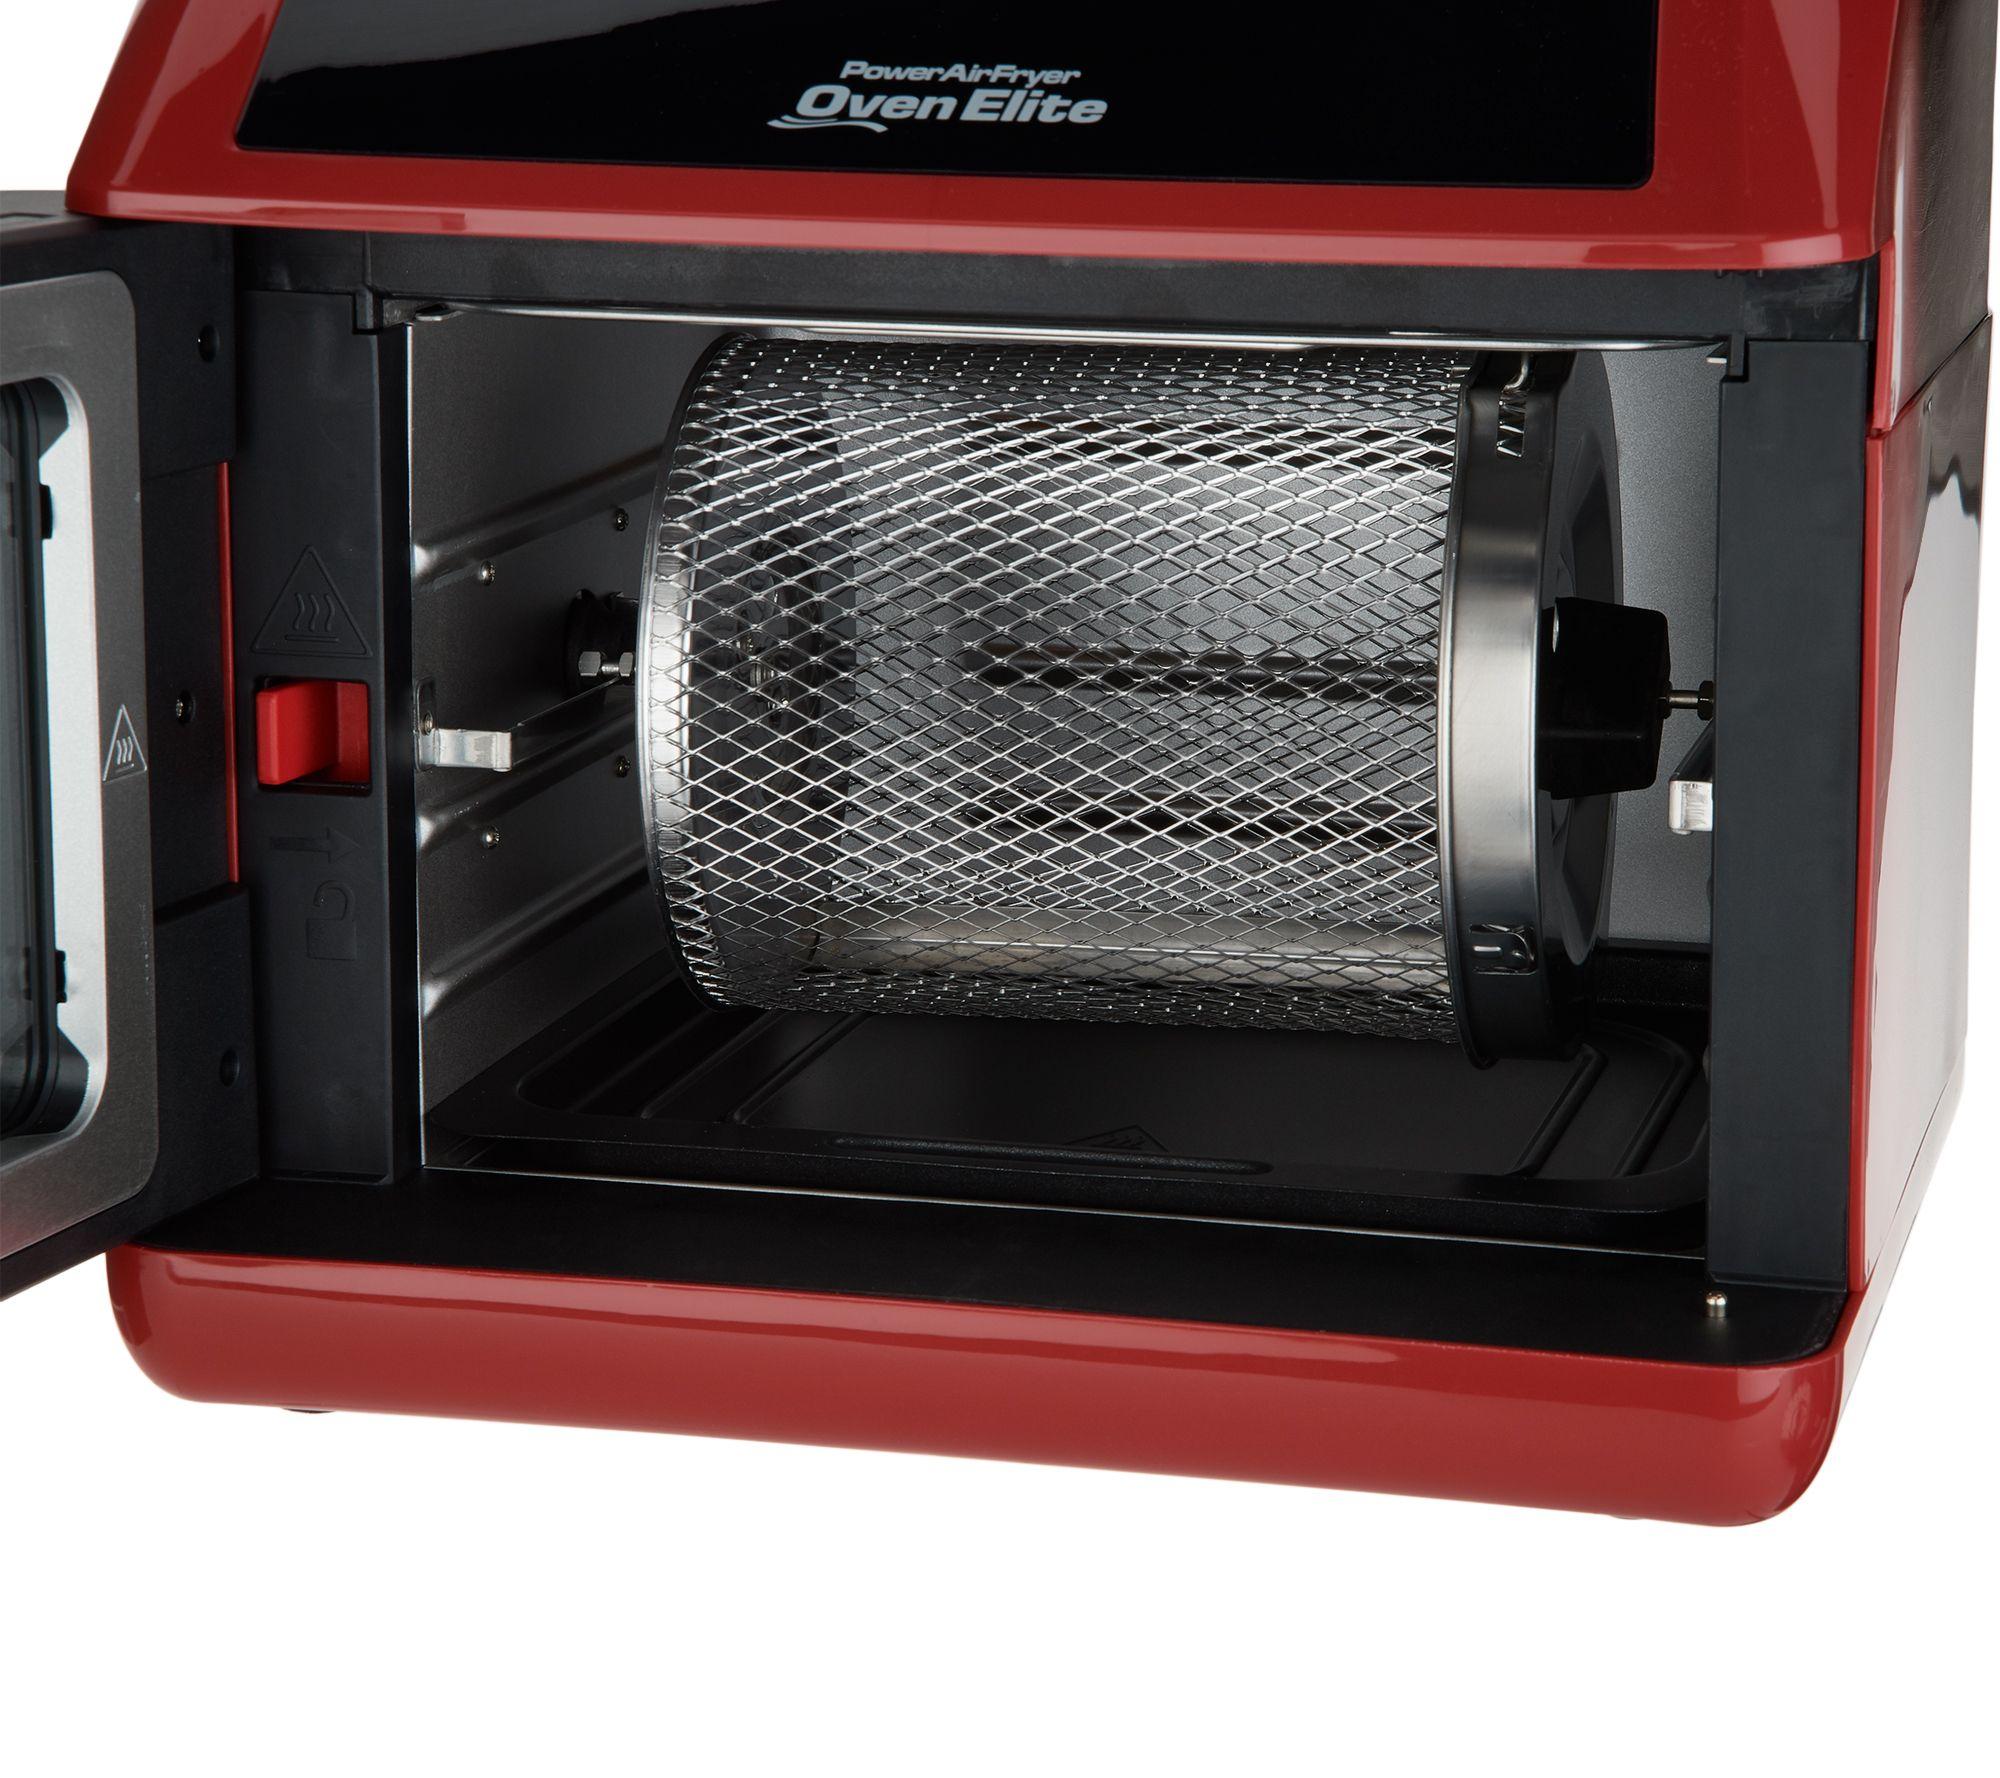 Power Air Fryer Oven Elite 6-qt with Accessories — QVC com